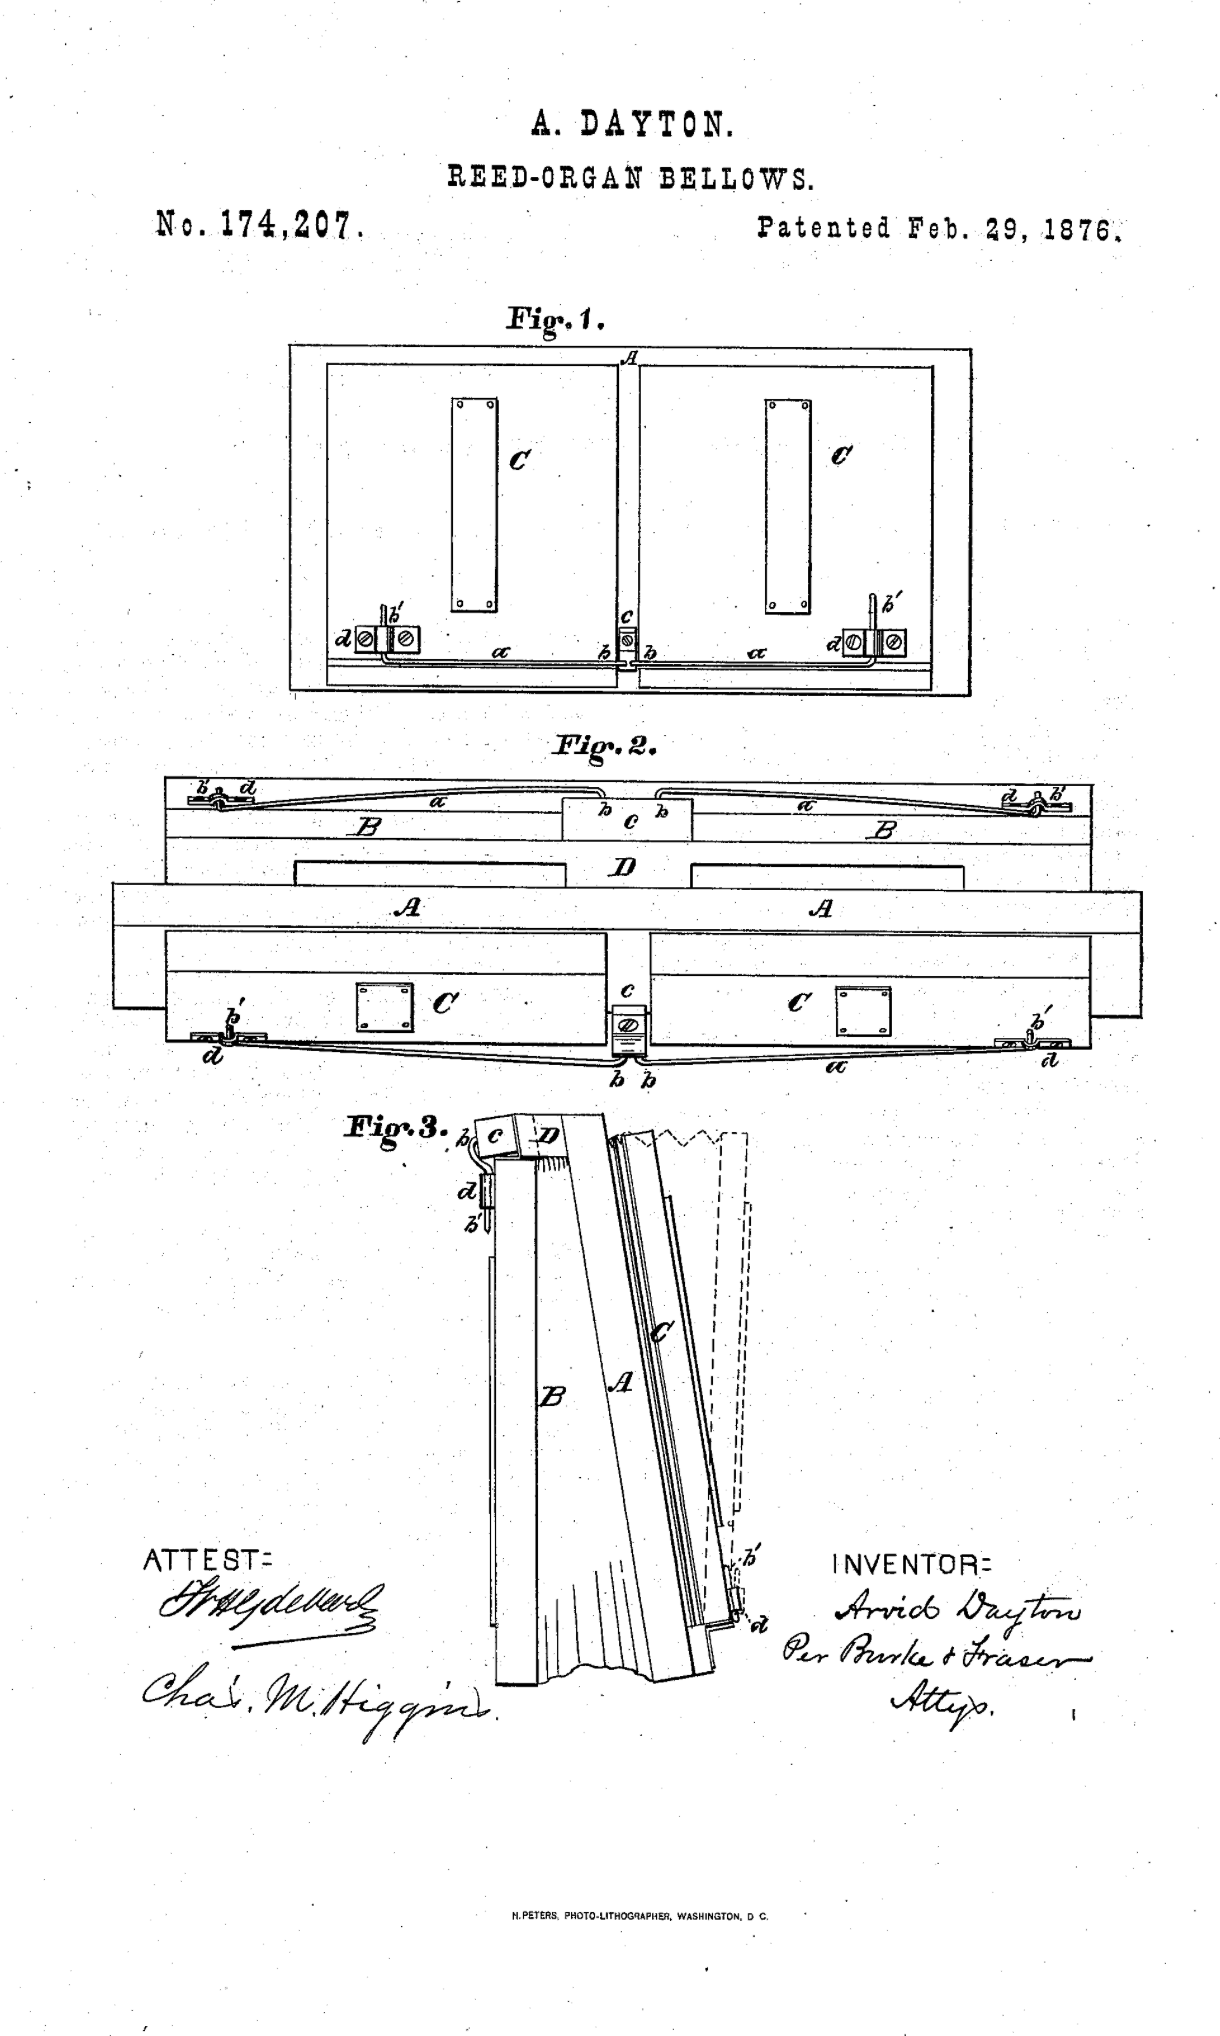 medium resolution of arvid dayton reed organ made in wolcottville torrington connecticut